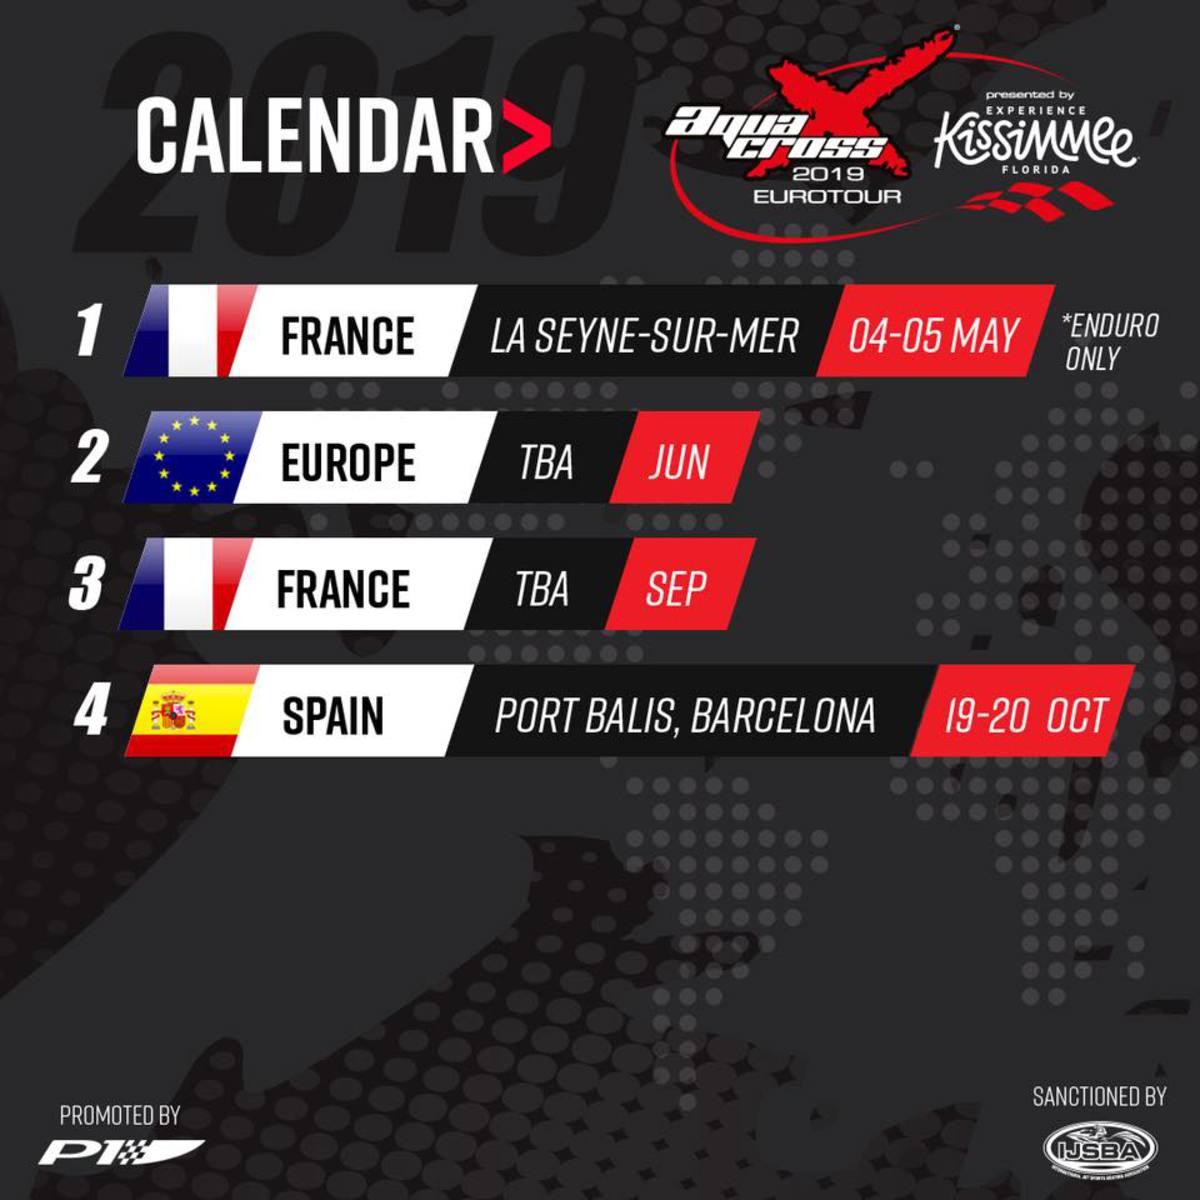 Race Calendar.P1 Announces Biggest Ever Race Calendar For 2019 P1 Aquax